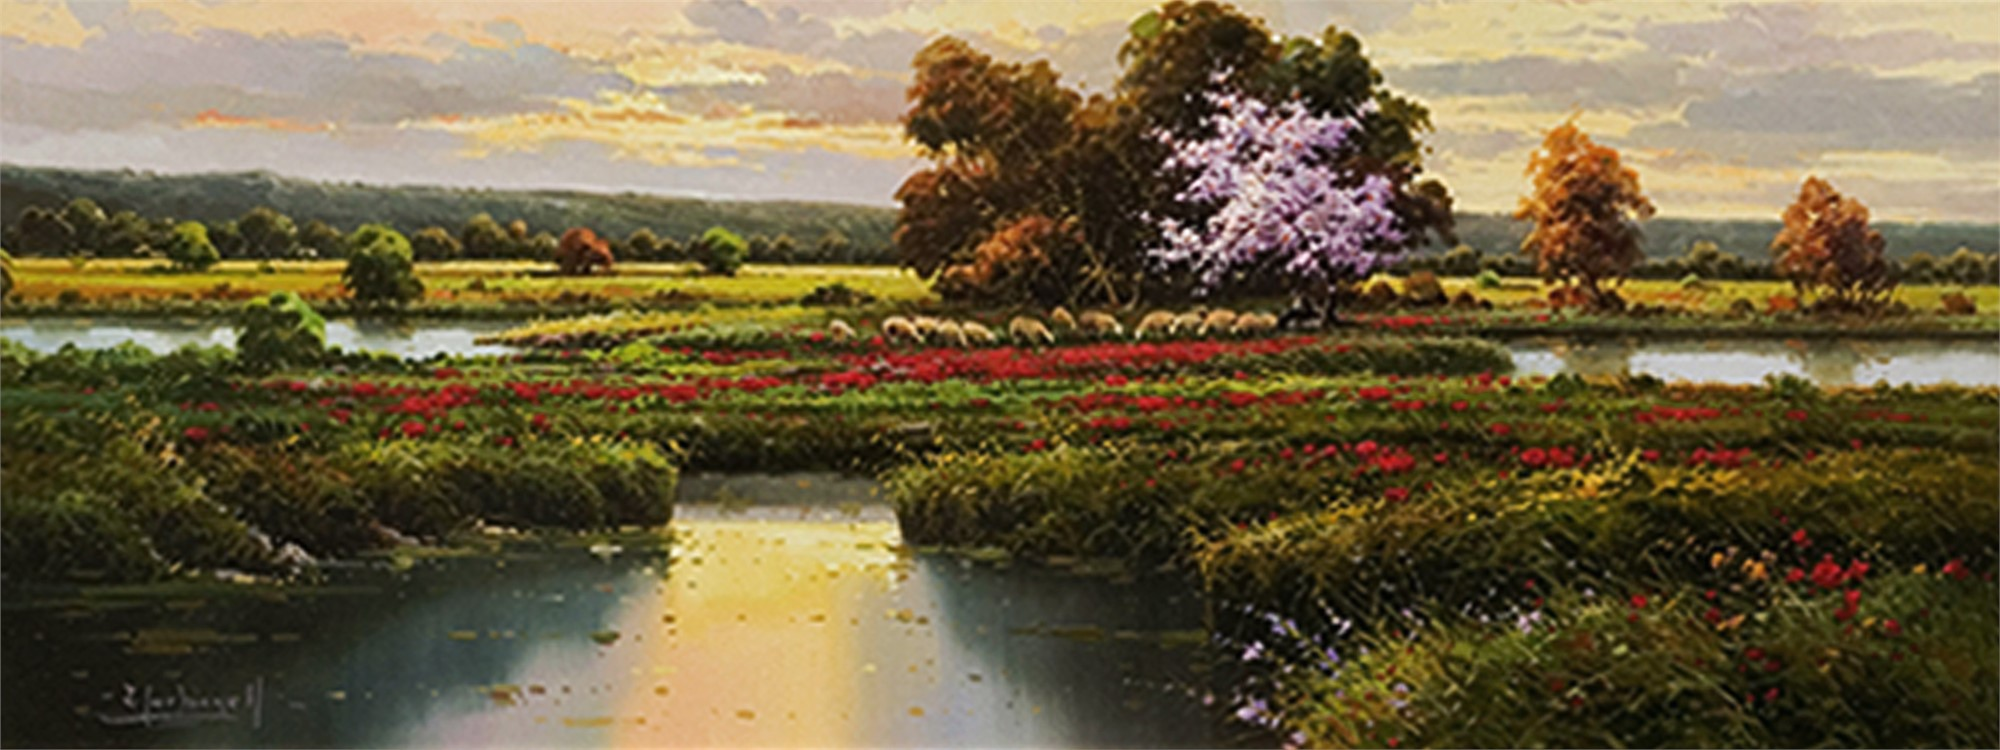 LANDSCAPE by JORGE